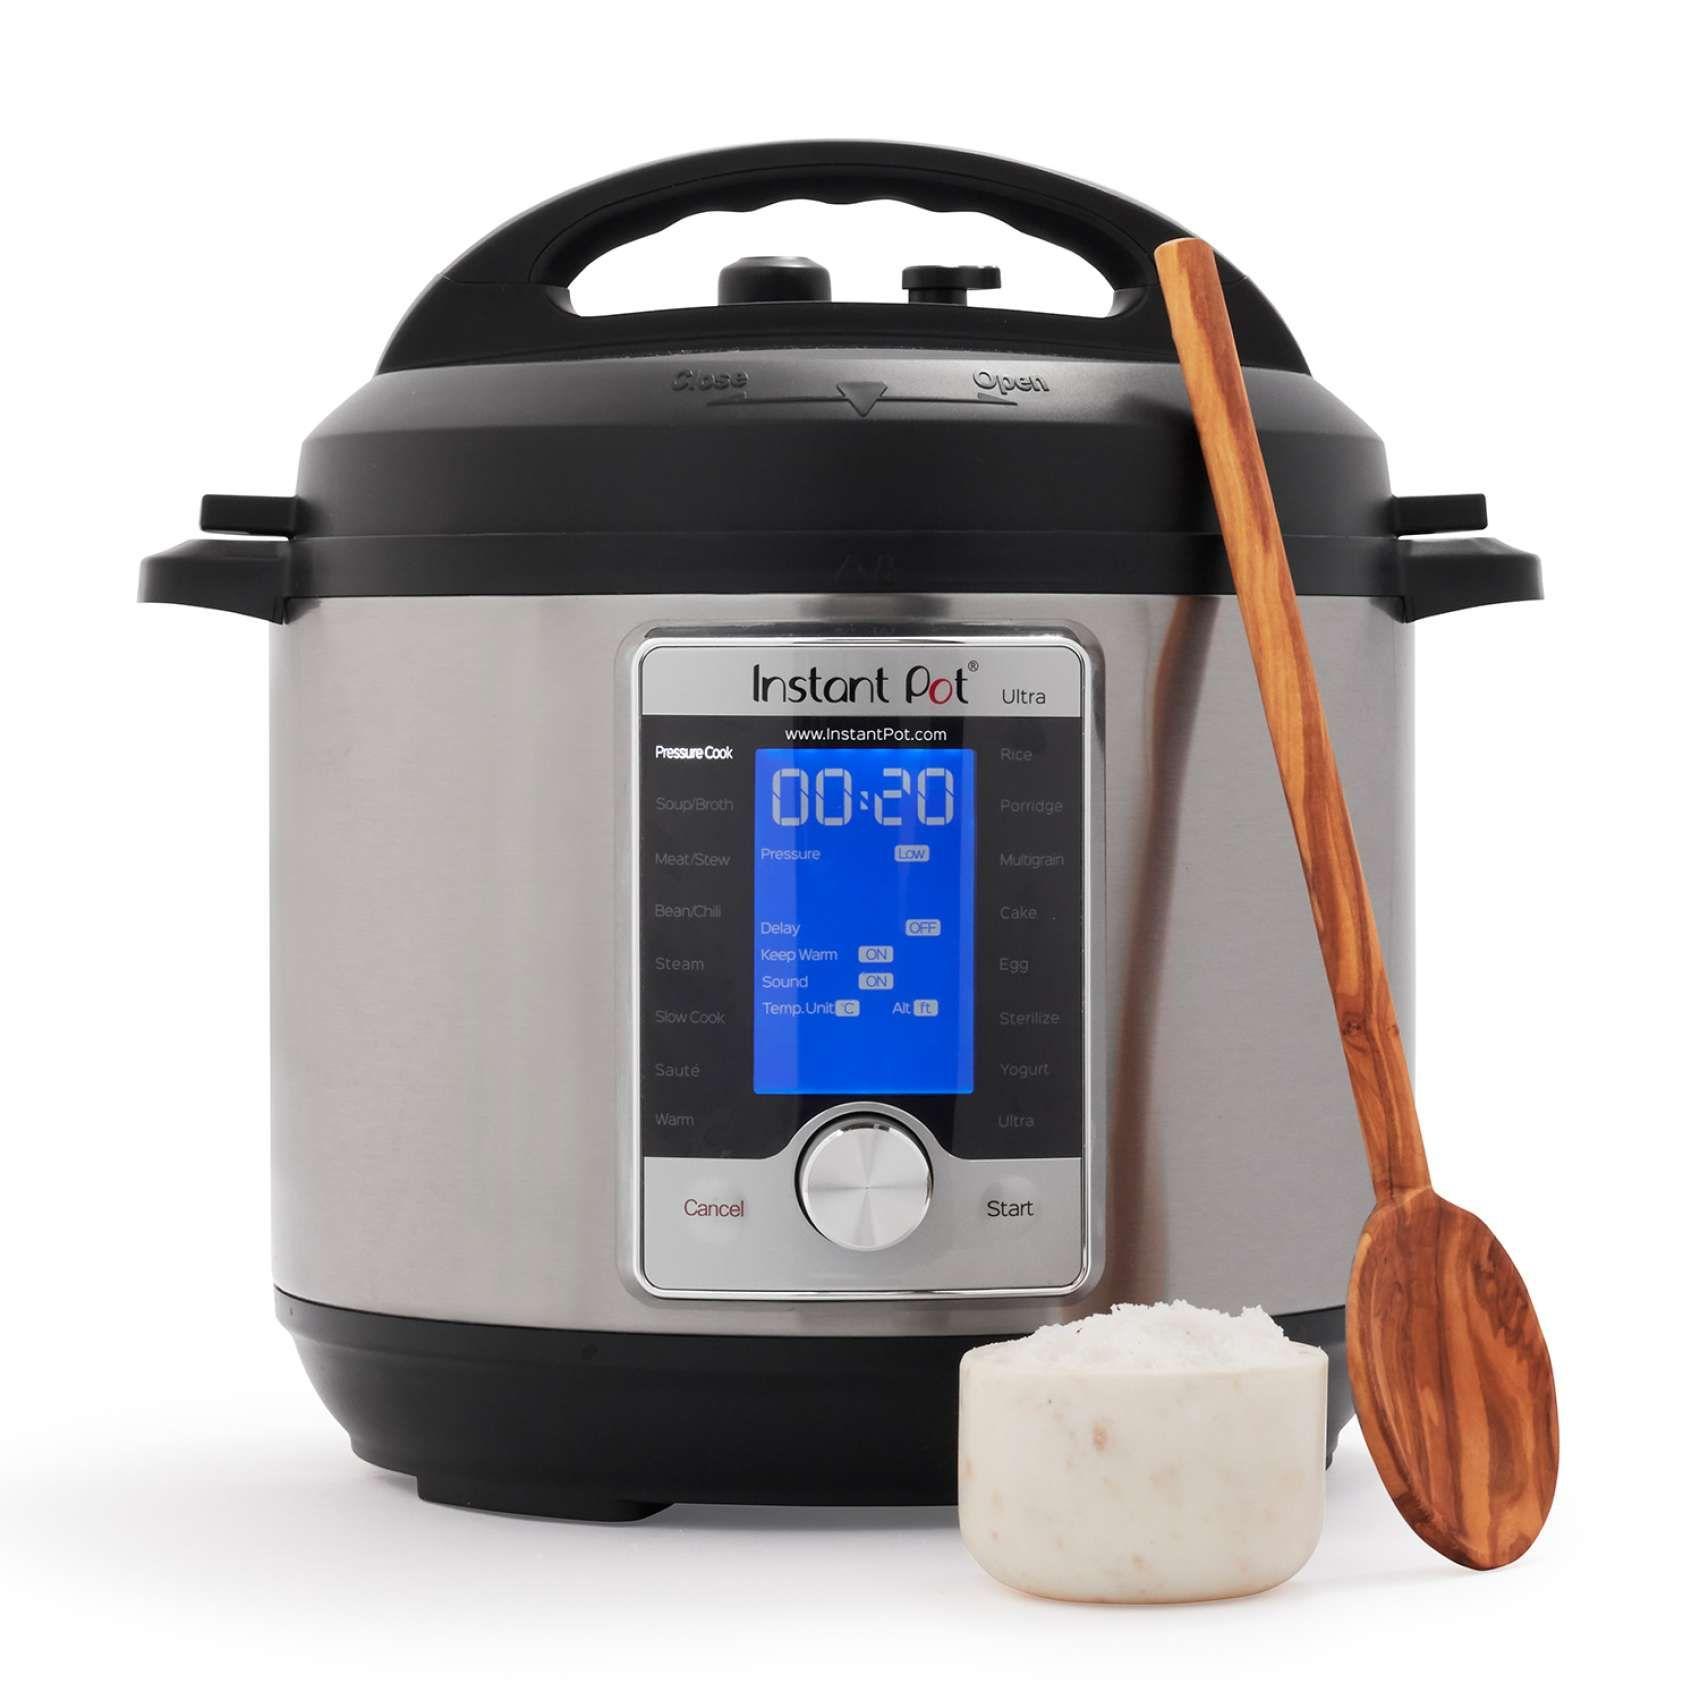 Instant Pot Ultra Instant pot, Instant pot steam